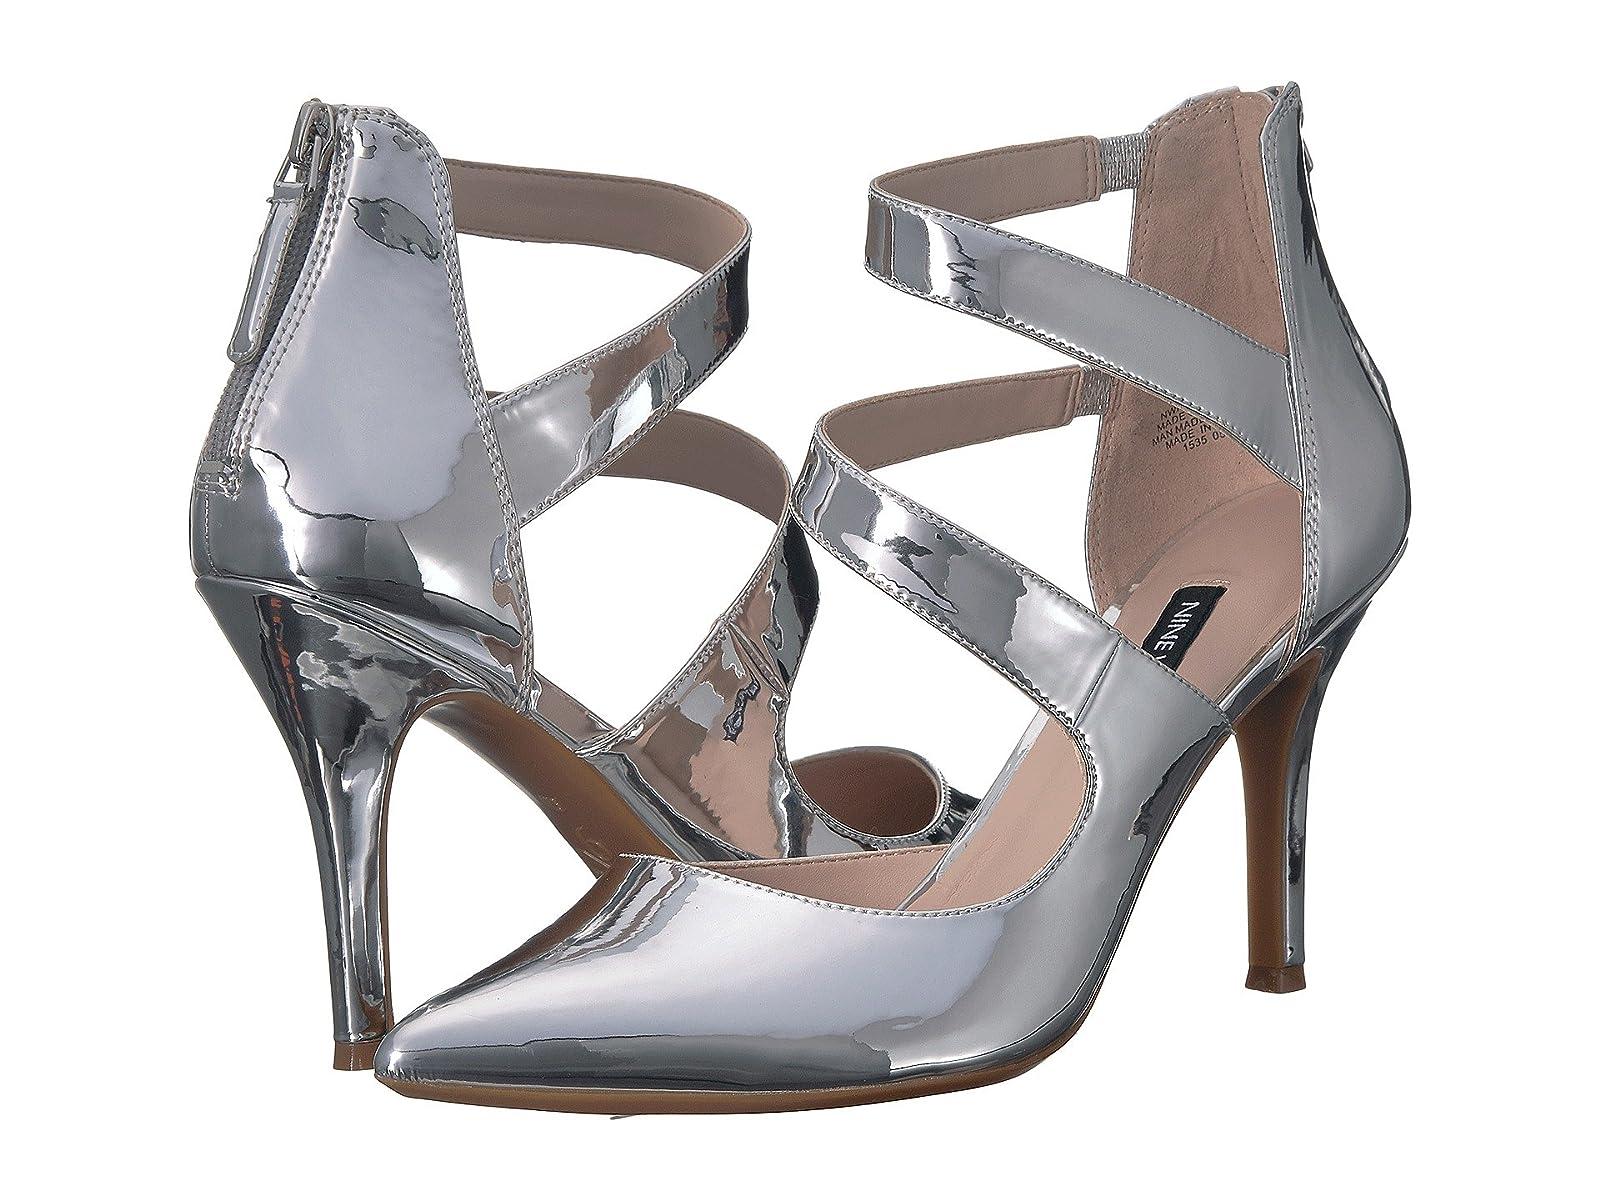 Nine West Florent9x9Atmospheric grades have affordable shoes